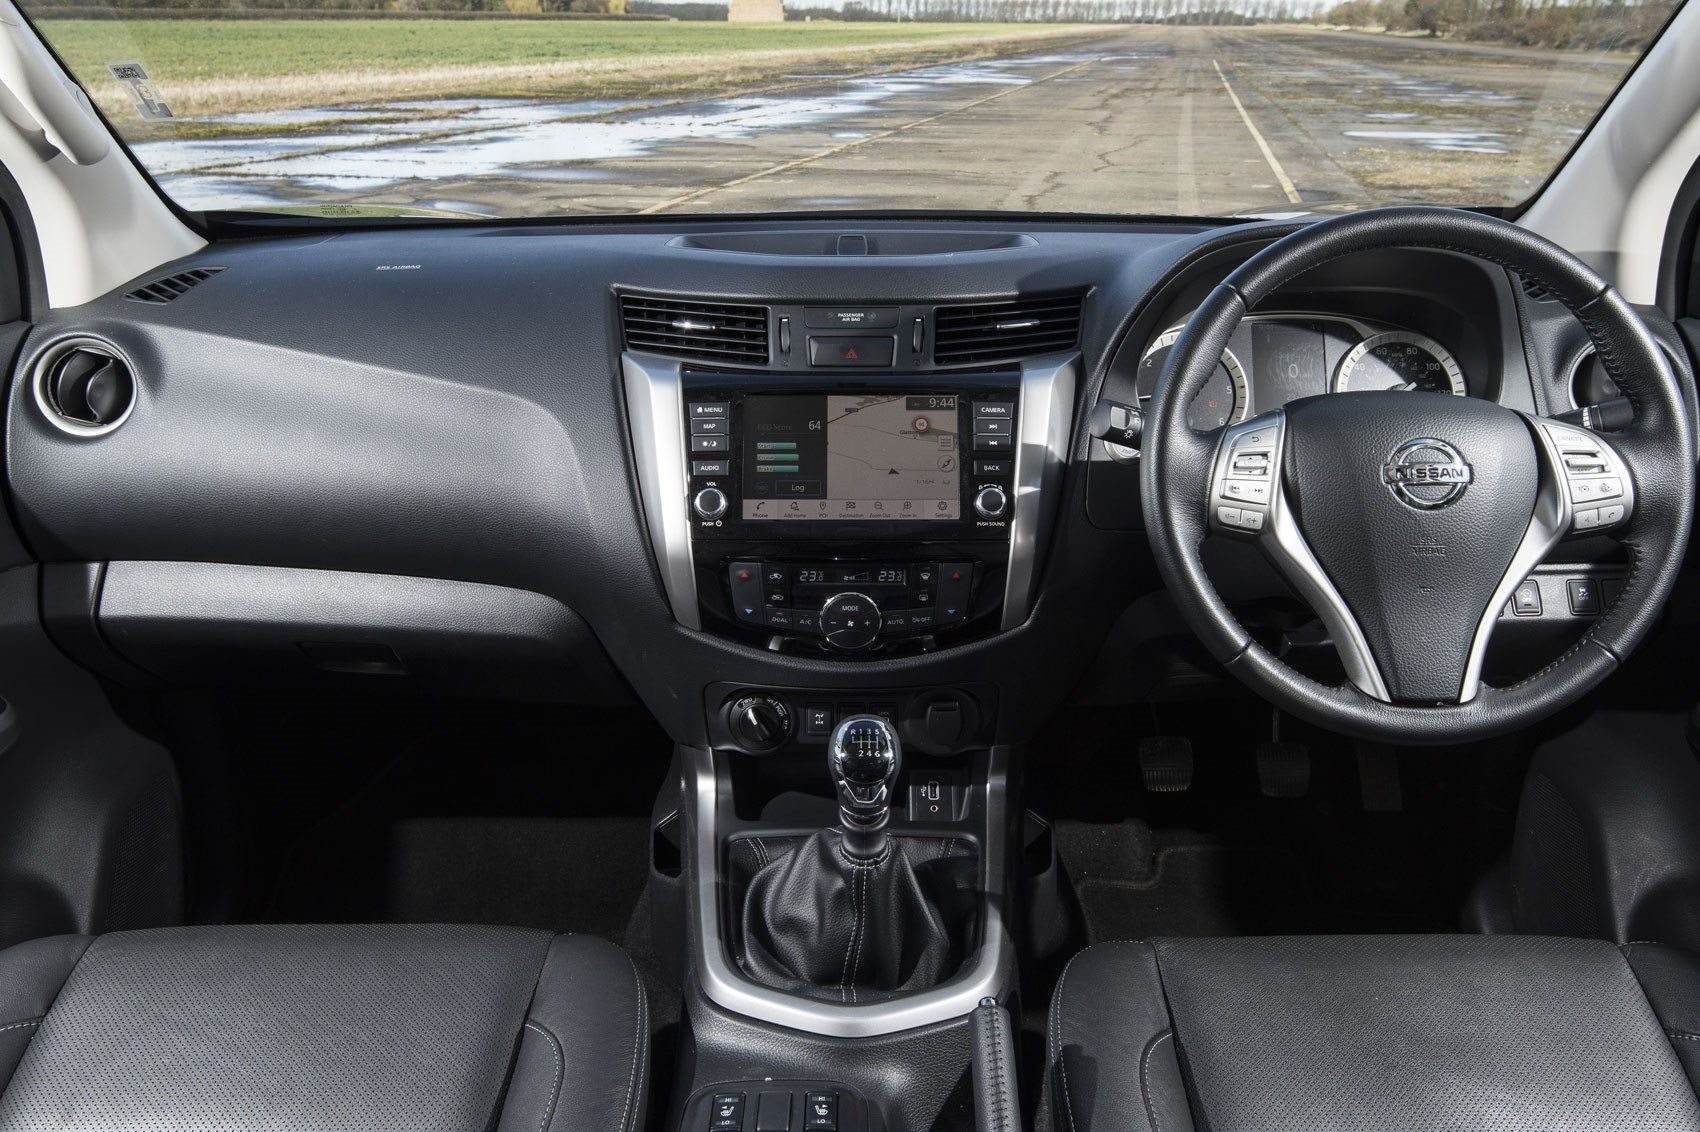 Nissan Navara review, 2019 update model, cab interior